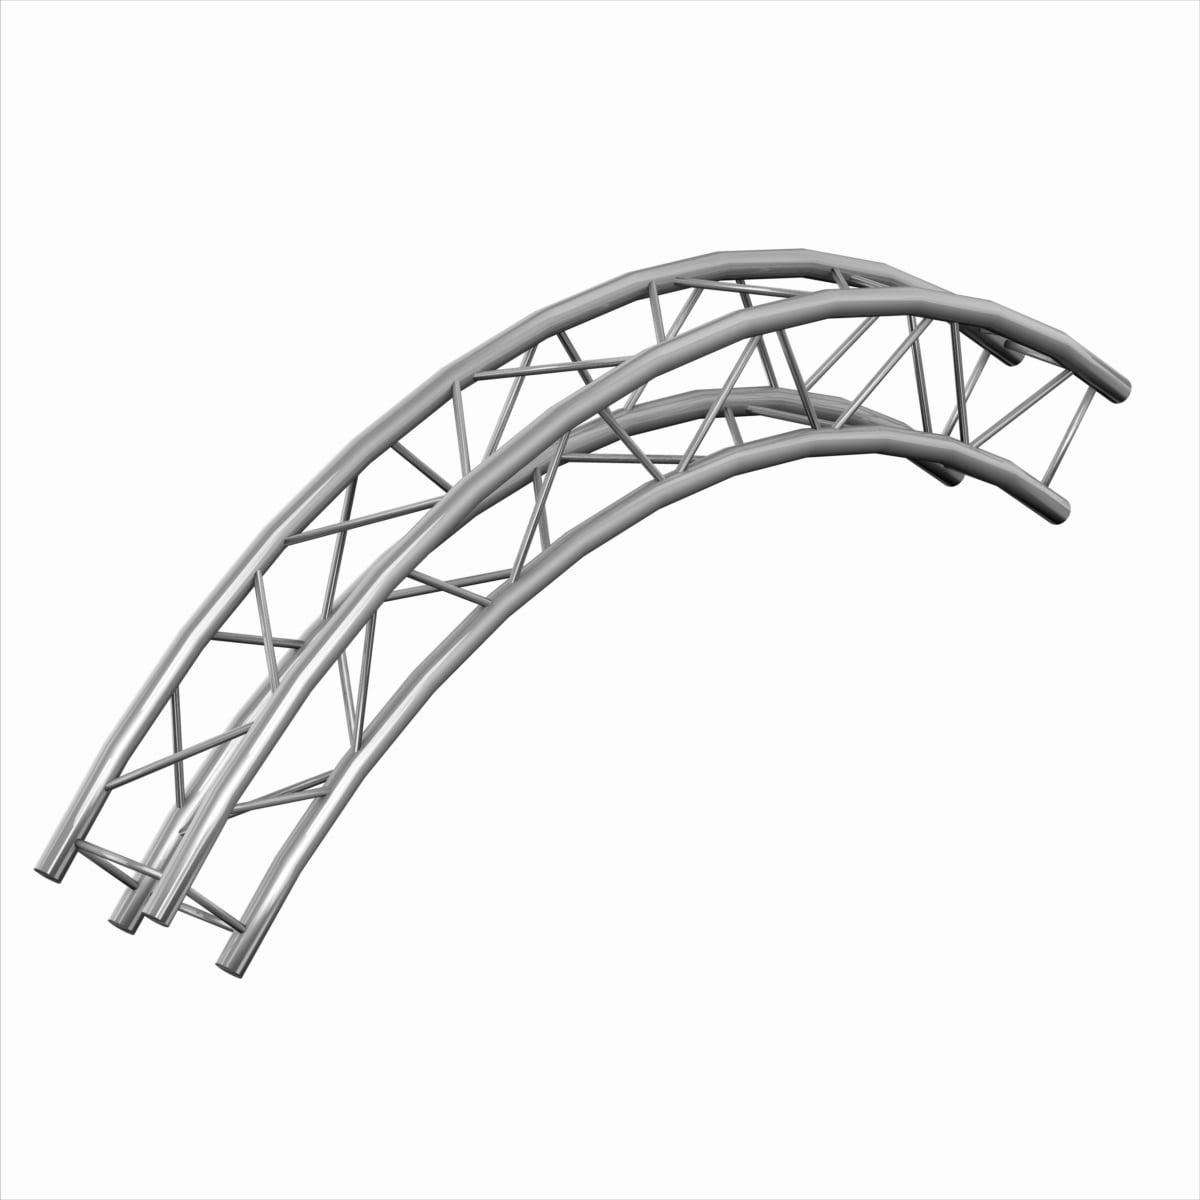 Trusst Ct290 420cir 90 90 Degree Arch Truss 2m